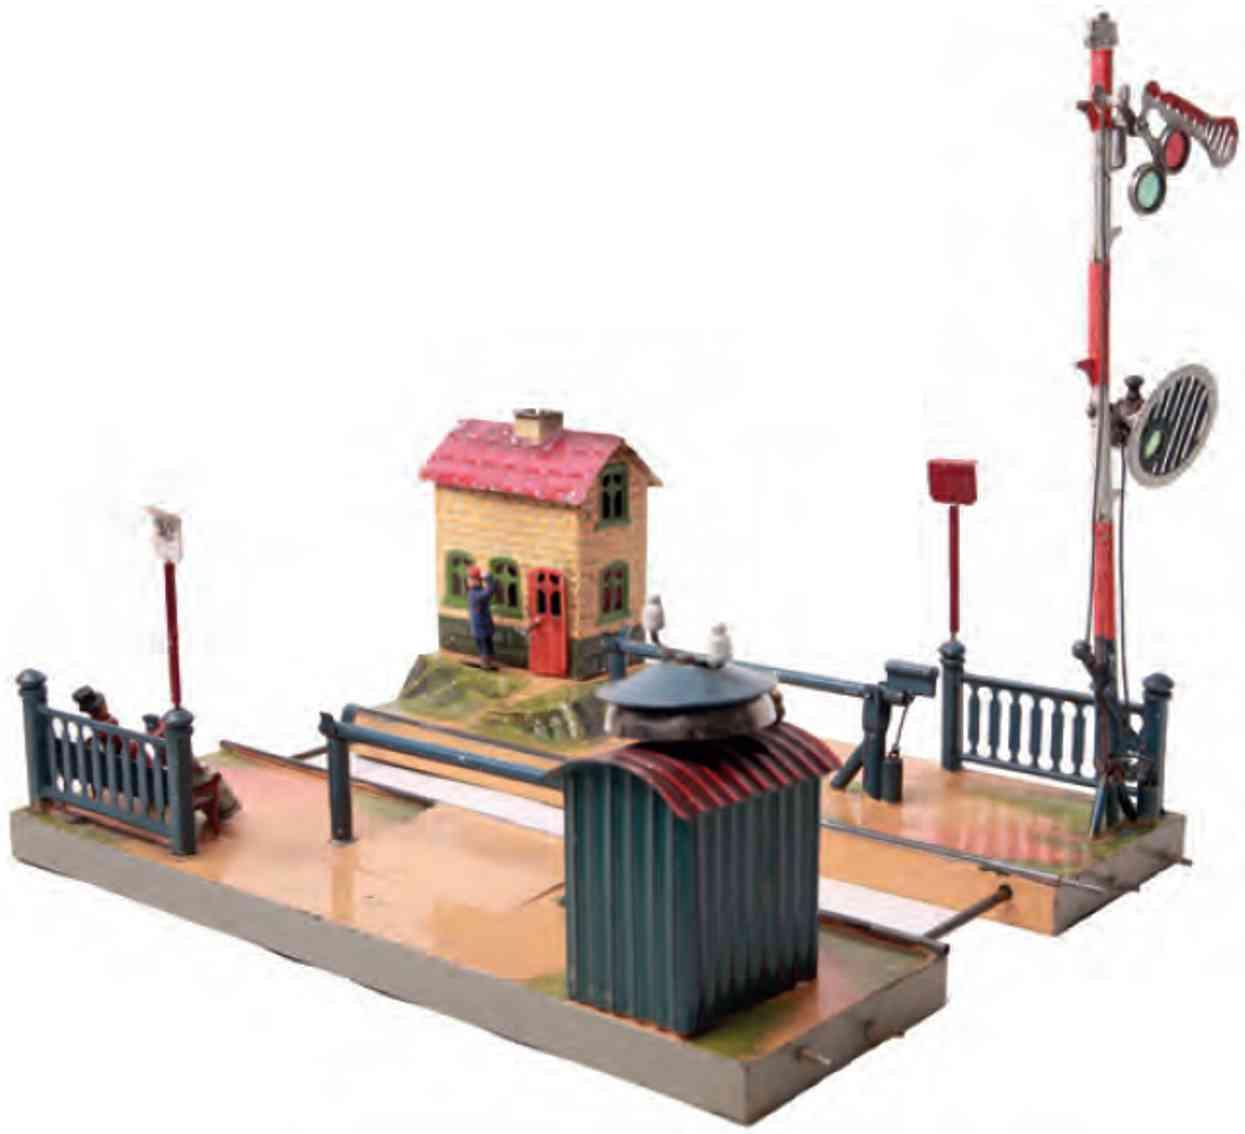 marklin maerklin 2698/2174 railway toy crossing gate with keeper's hut compressed air control